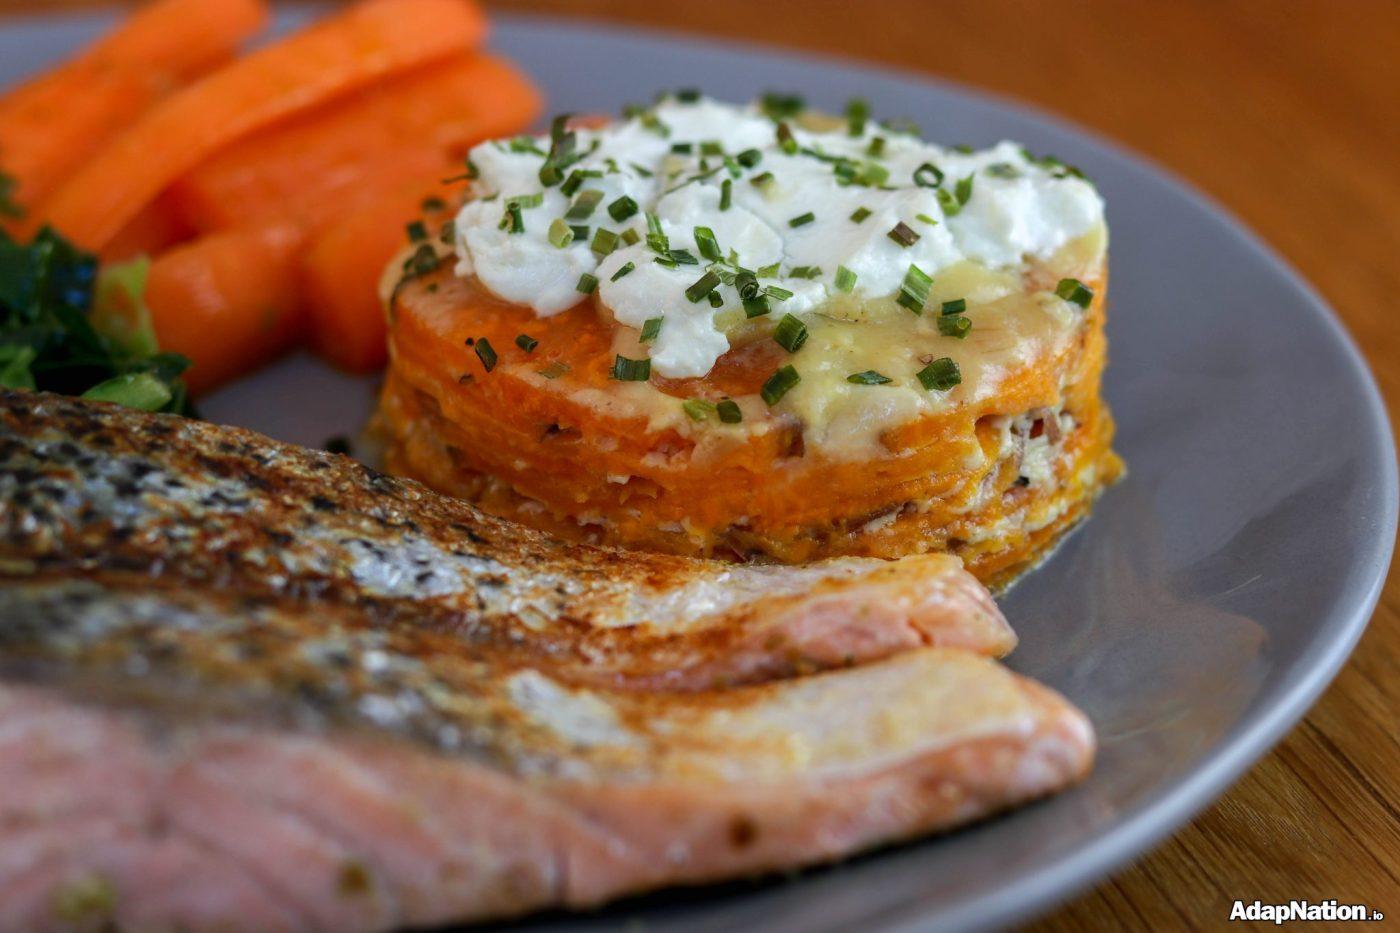 Sweet Potato Dauphinoise, Pan-Fried Salmon & Veg